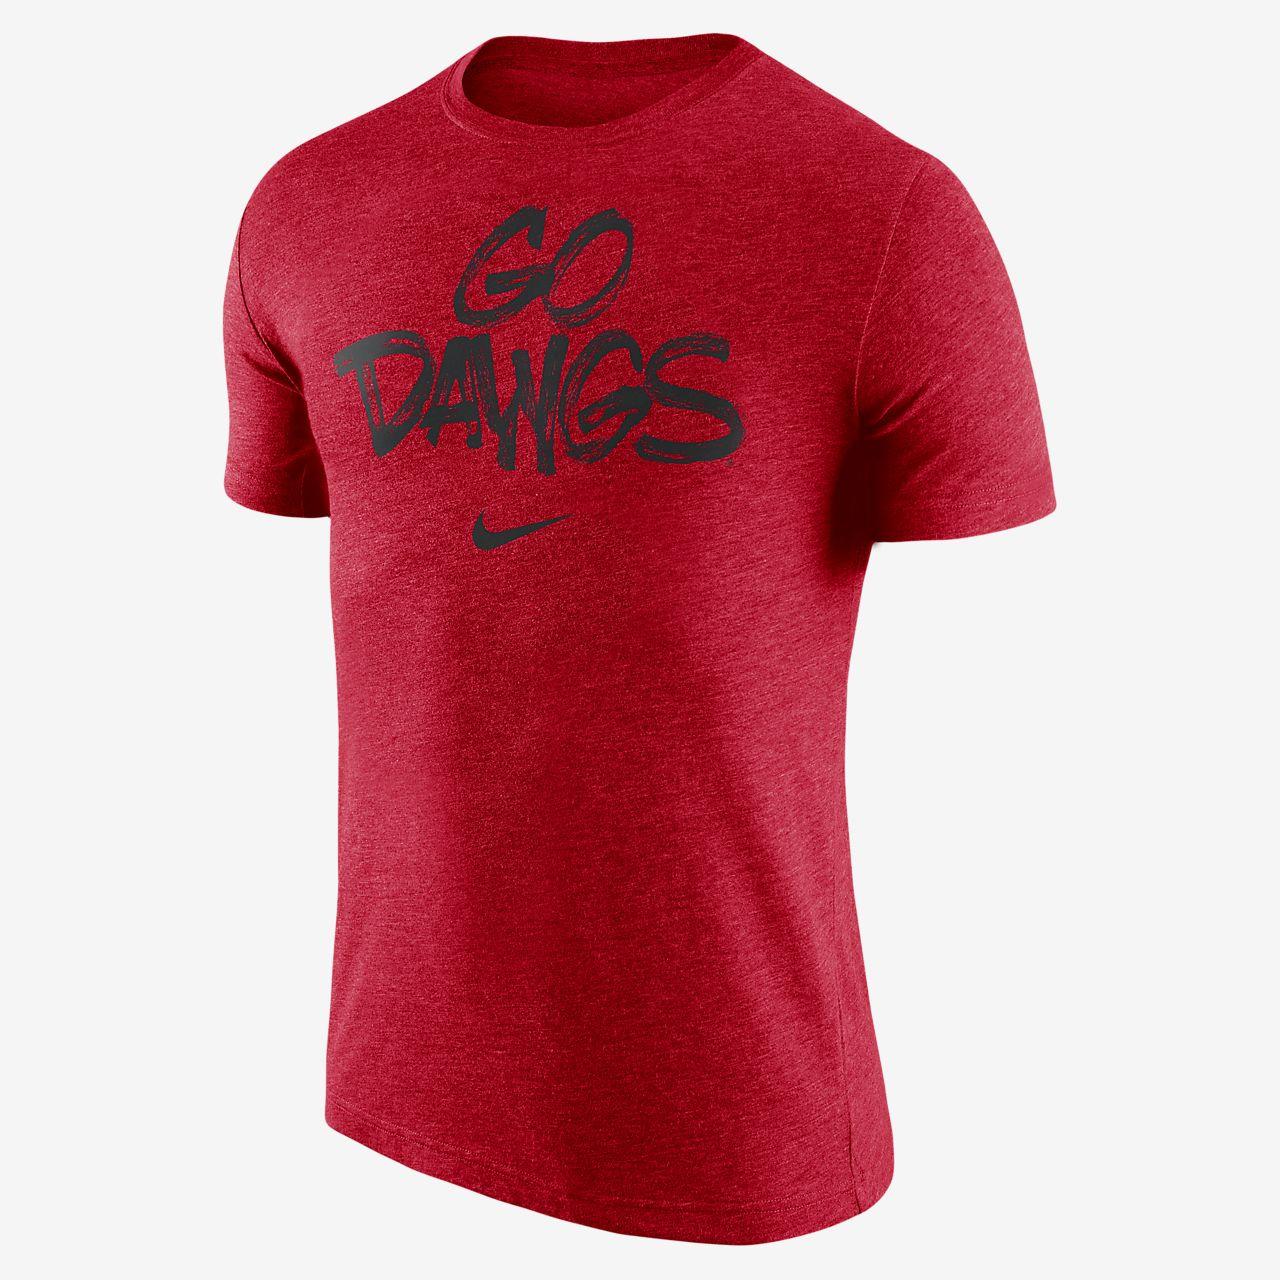 Nike College (Georgia) Men's T-Shirt